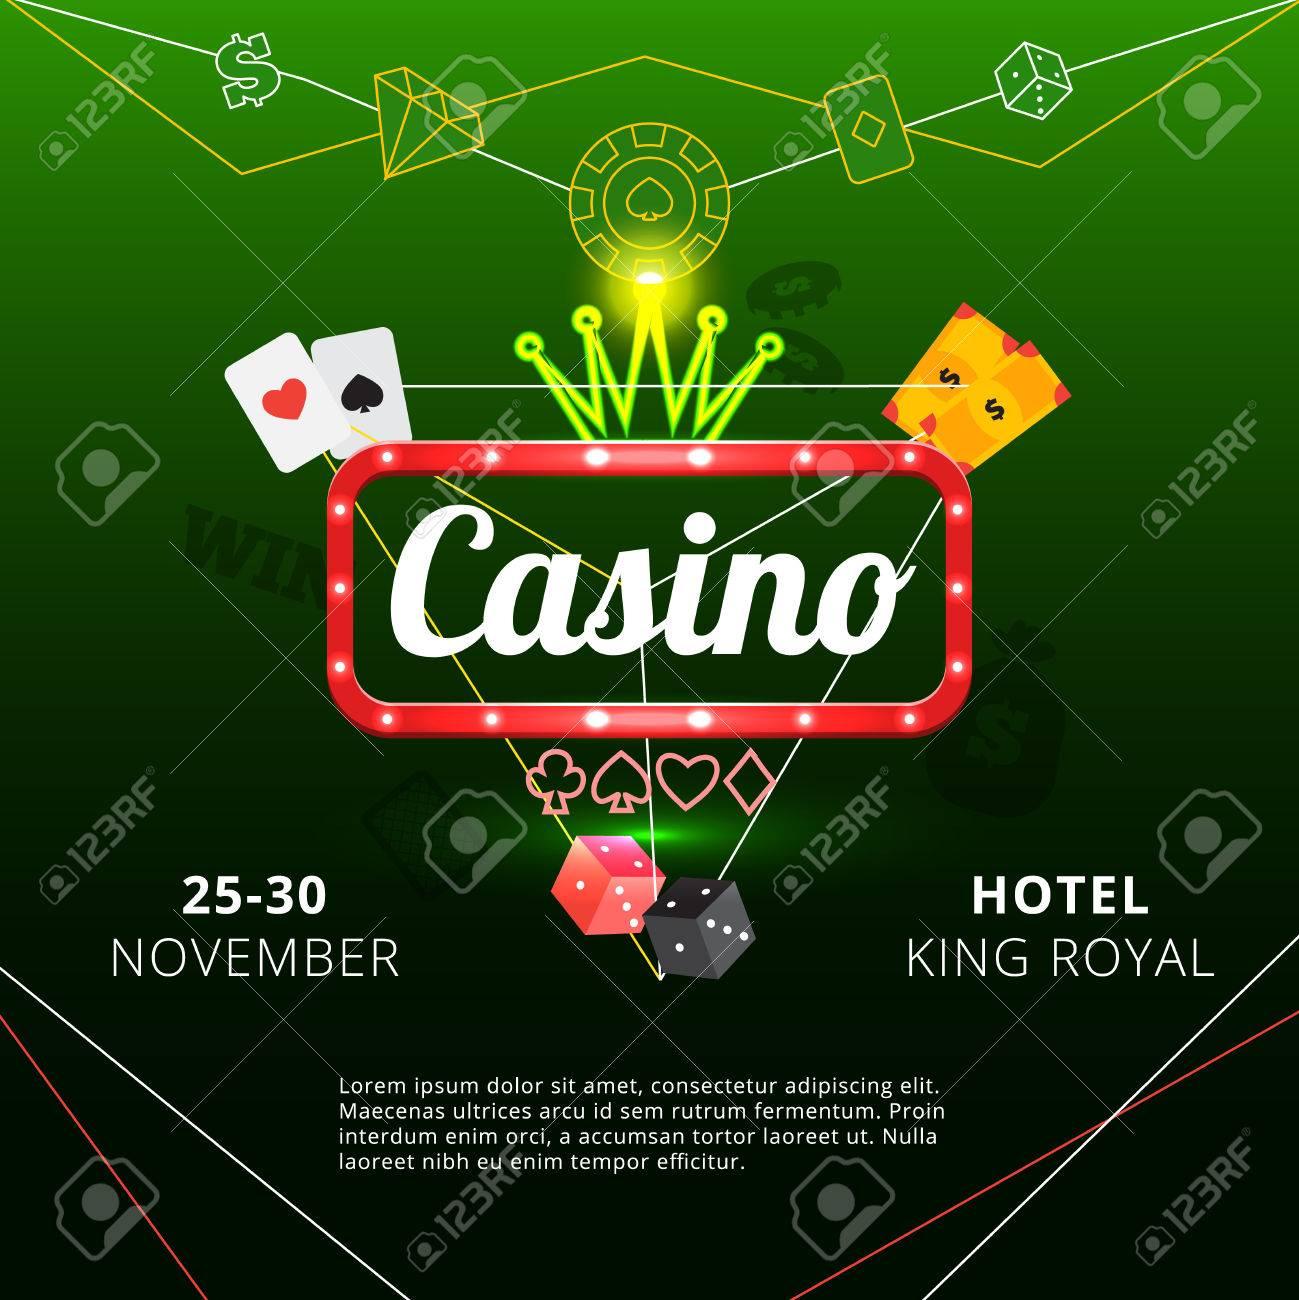 Invitation poster to hotel king royal casino with neon sign and invitation poster to hotel king royal casino with neon sign and crown on green background flat stopboris Gallery